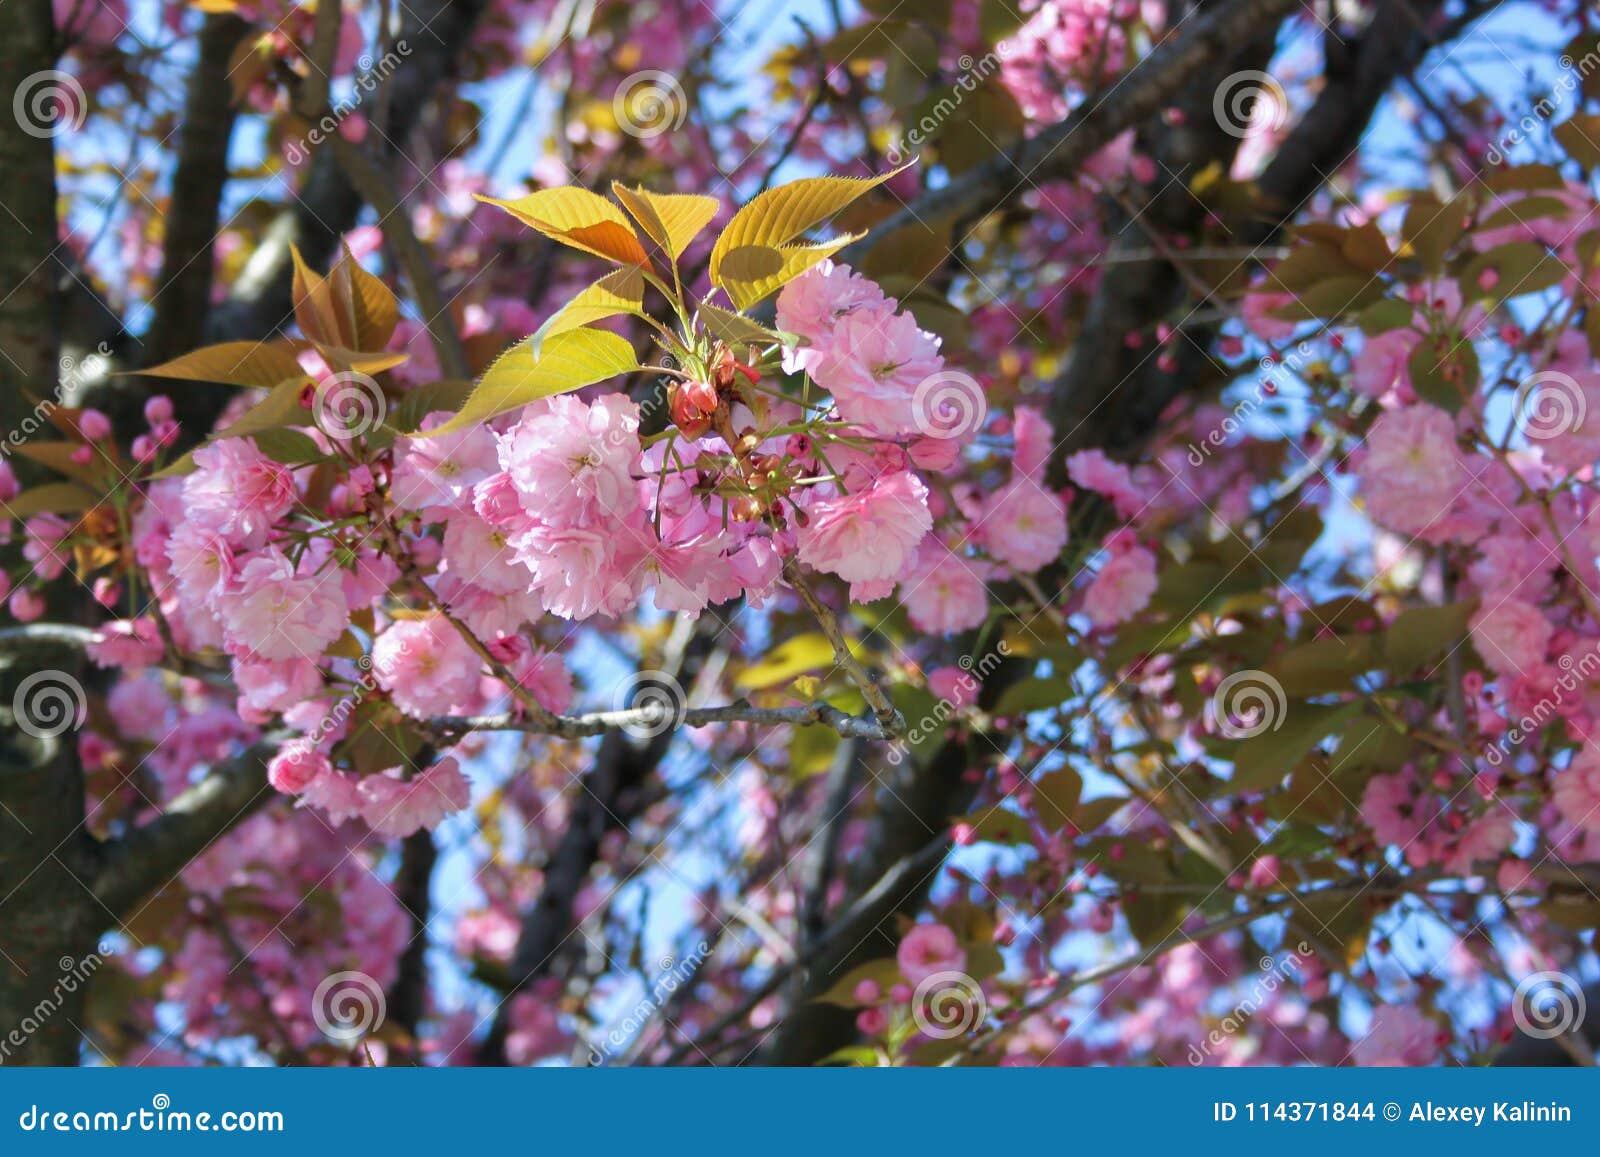 Close up of the pink flowers of japan sakura cherry tree in april close up of the pink flowers of japan sakura cherry tree in april against bright blue mightylinksfo